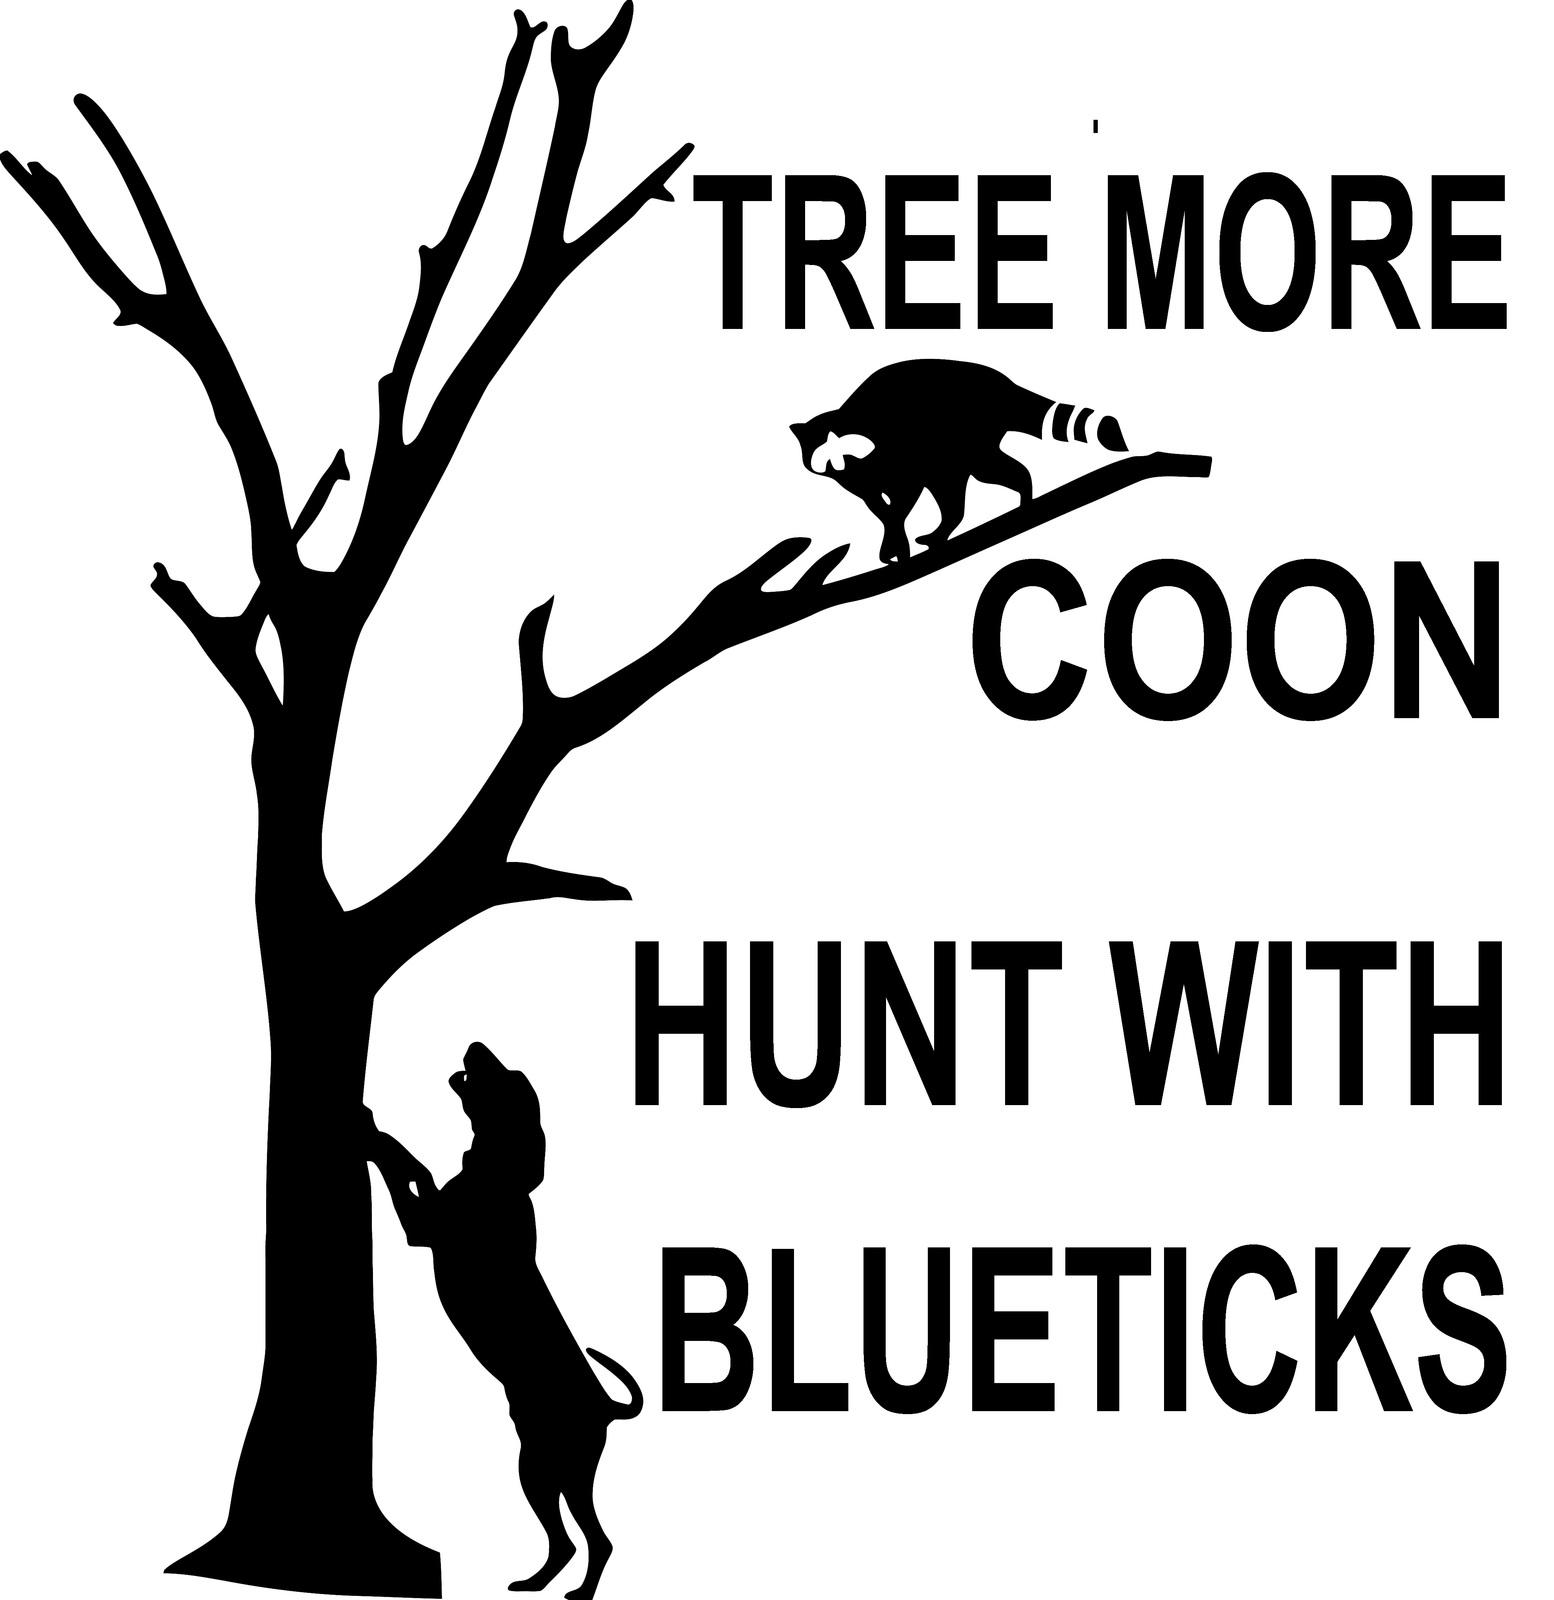 T Shirt Shirt Coon Hound Dog Hunter Coonhound Hunting Tree